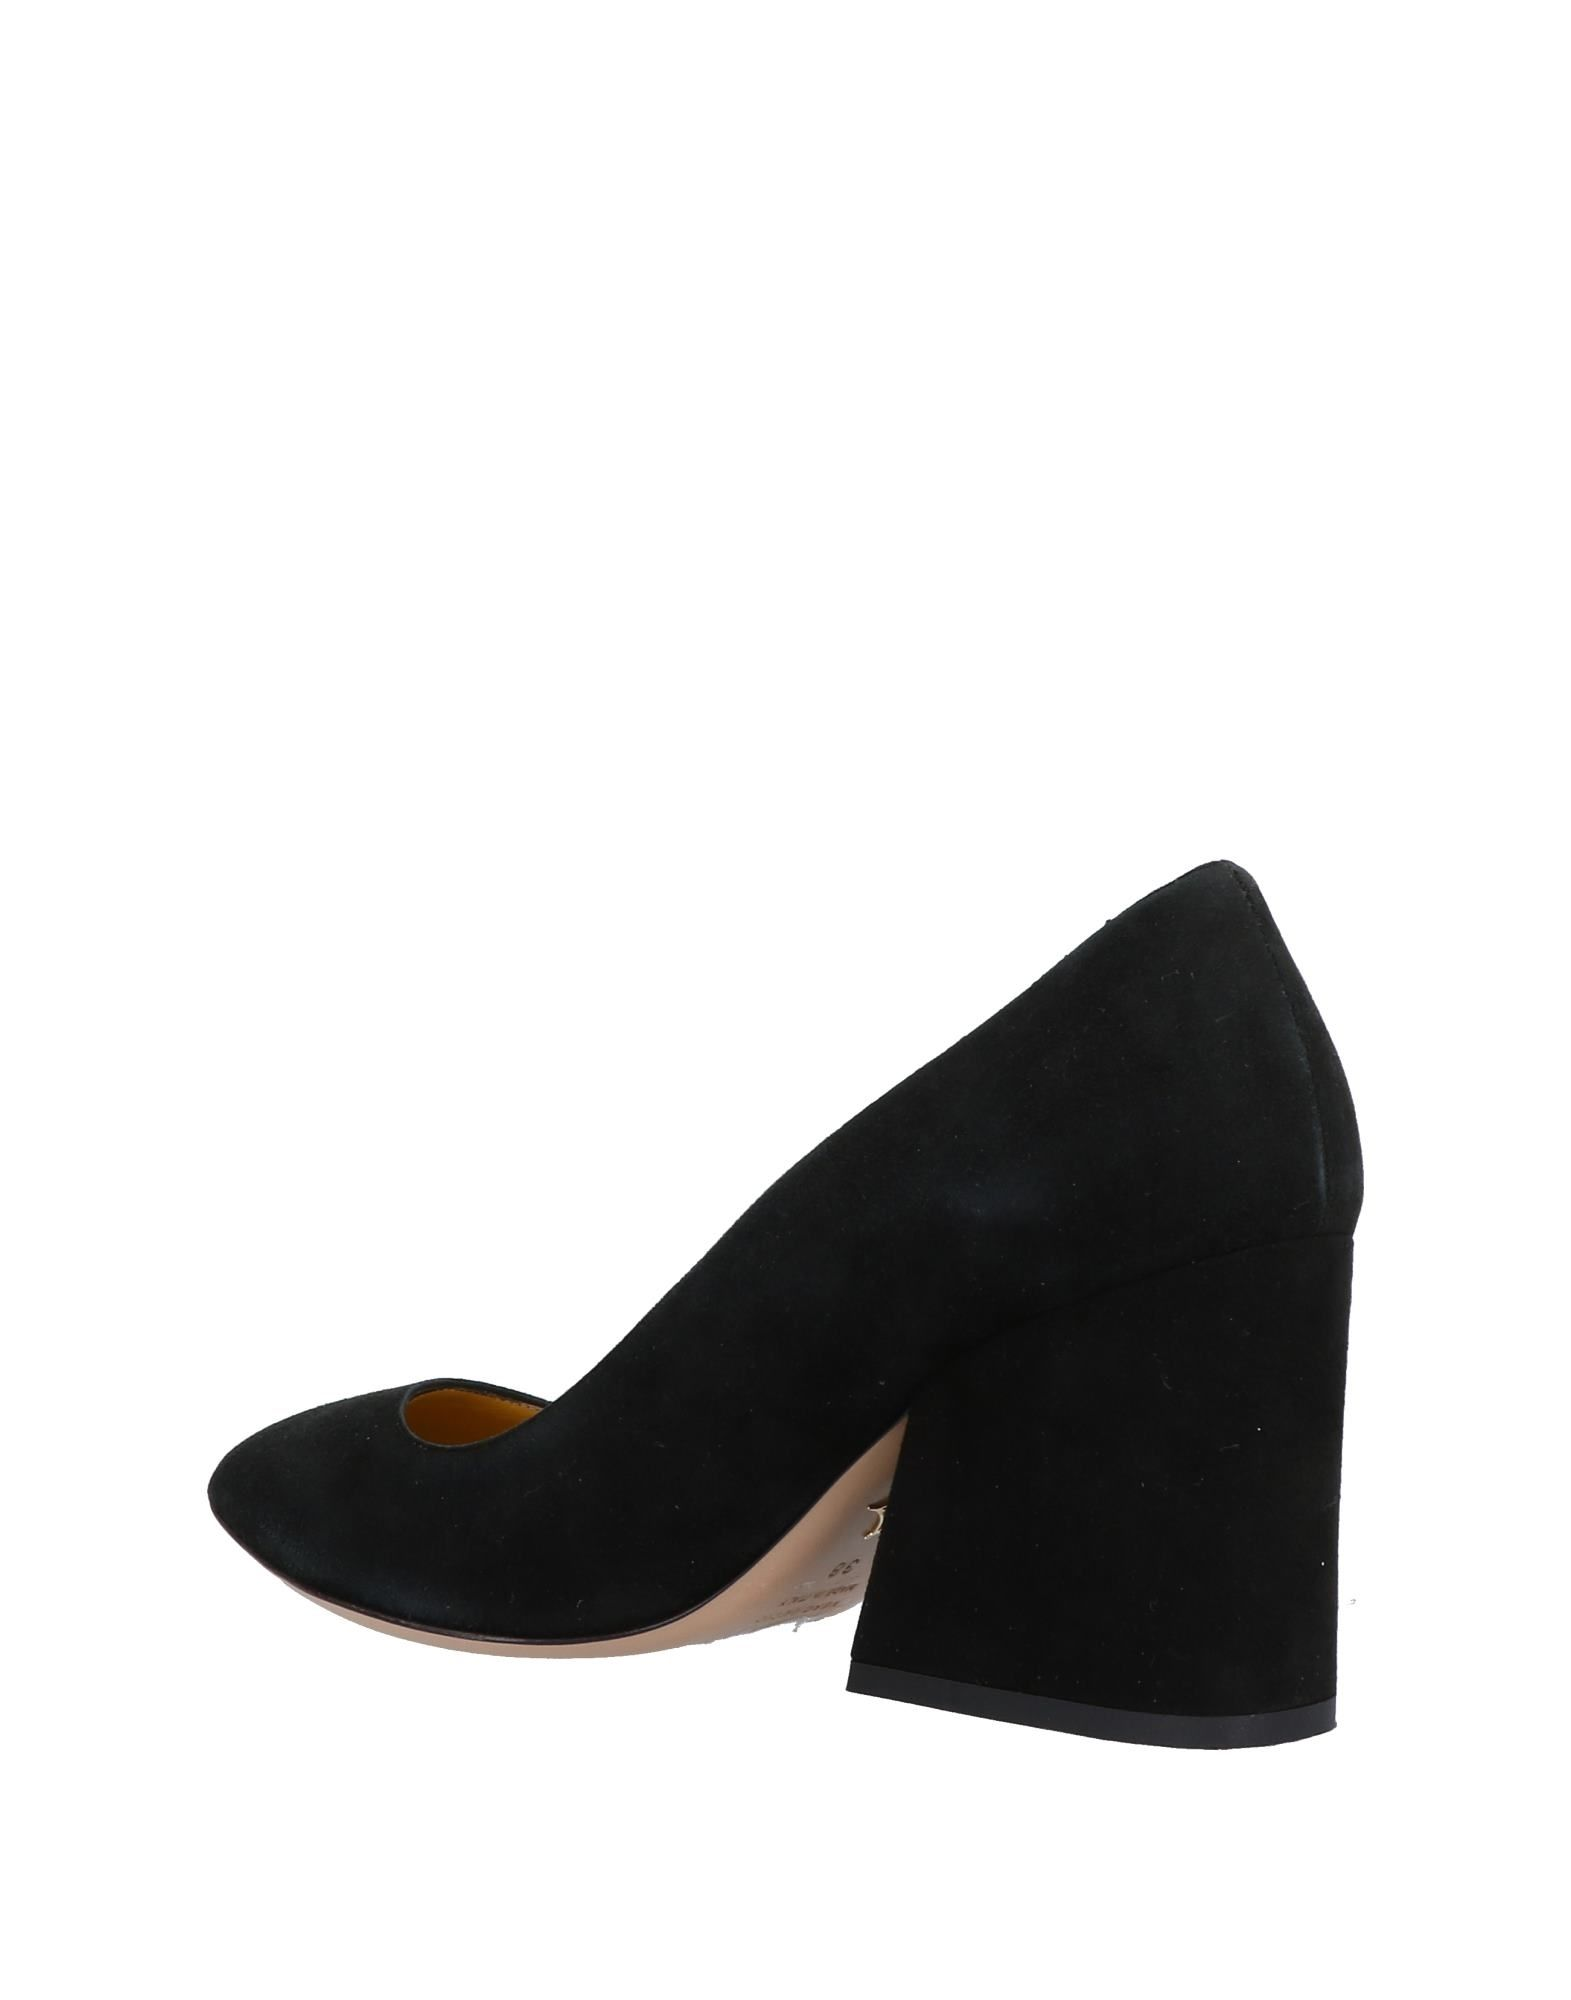 Charlotte Olympia Pumps Damen  11461247FPGut aussehende strapazierfähige Schuhe Schuhe Schuhe c01568